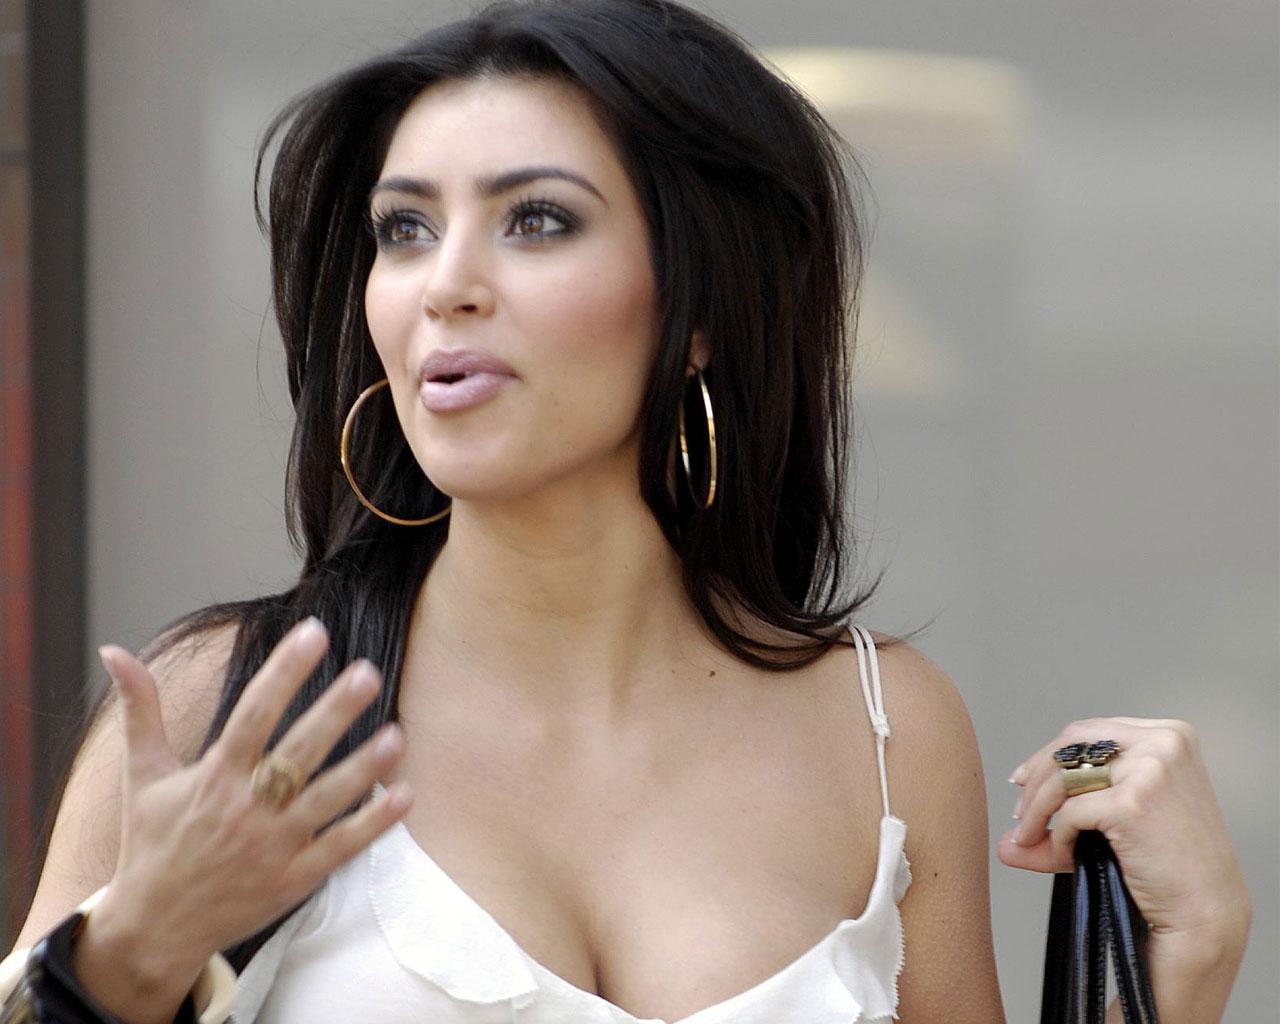 http://3.bp.blogspot.com/-aSRwbeX2gkg/Tv8hIJc3uvI/AAAAAAAADOI/35YSm0VIsTg/s1600/kim-kardashian_010.jpg